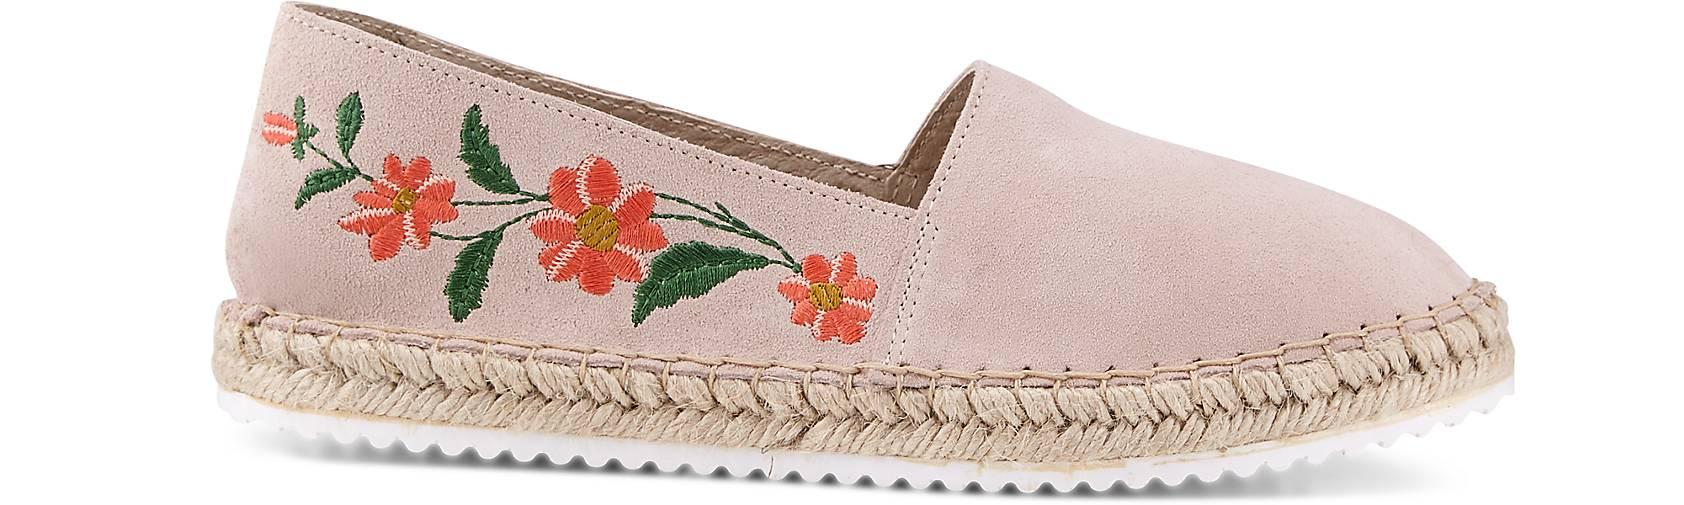 Cox Velours-Espadrille Gute in rosa kaufen - 46891701 | GÖRTZ Gute Velours-Espadrille Qualität beliebte Schuhe aa227b